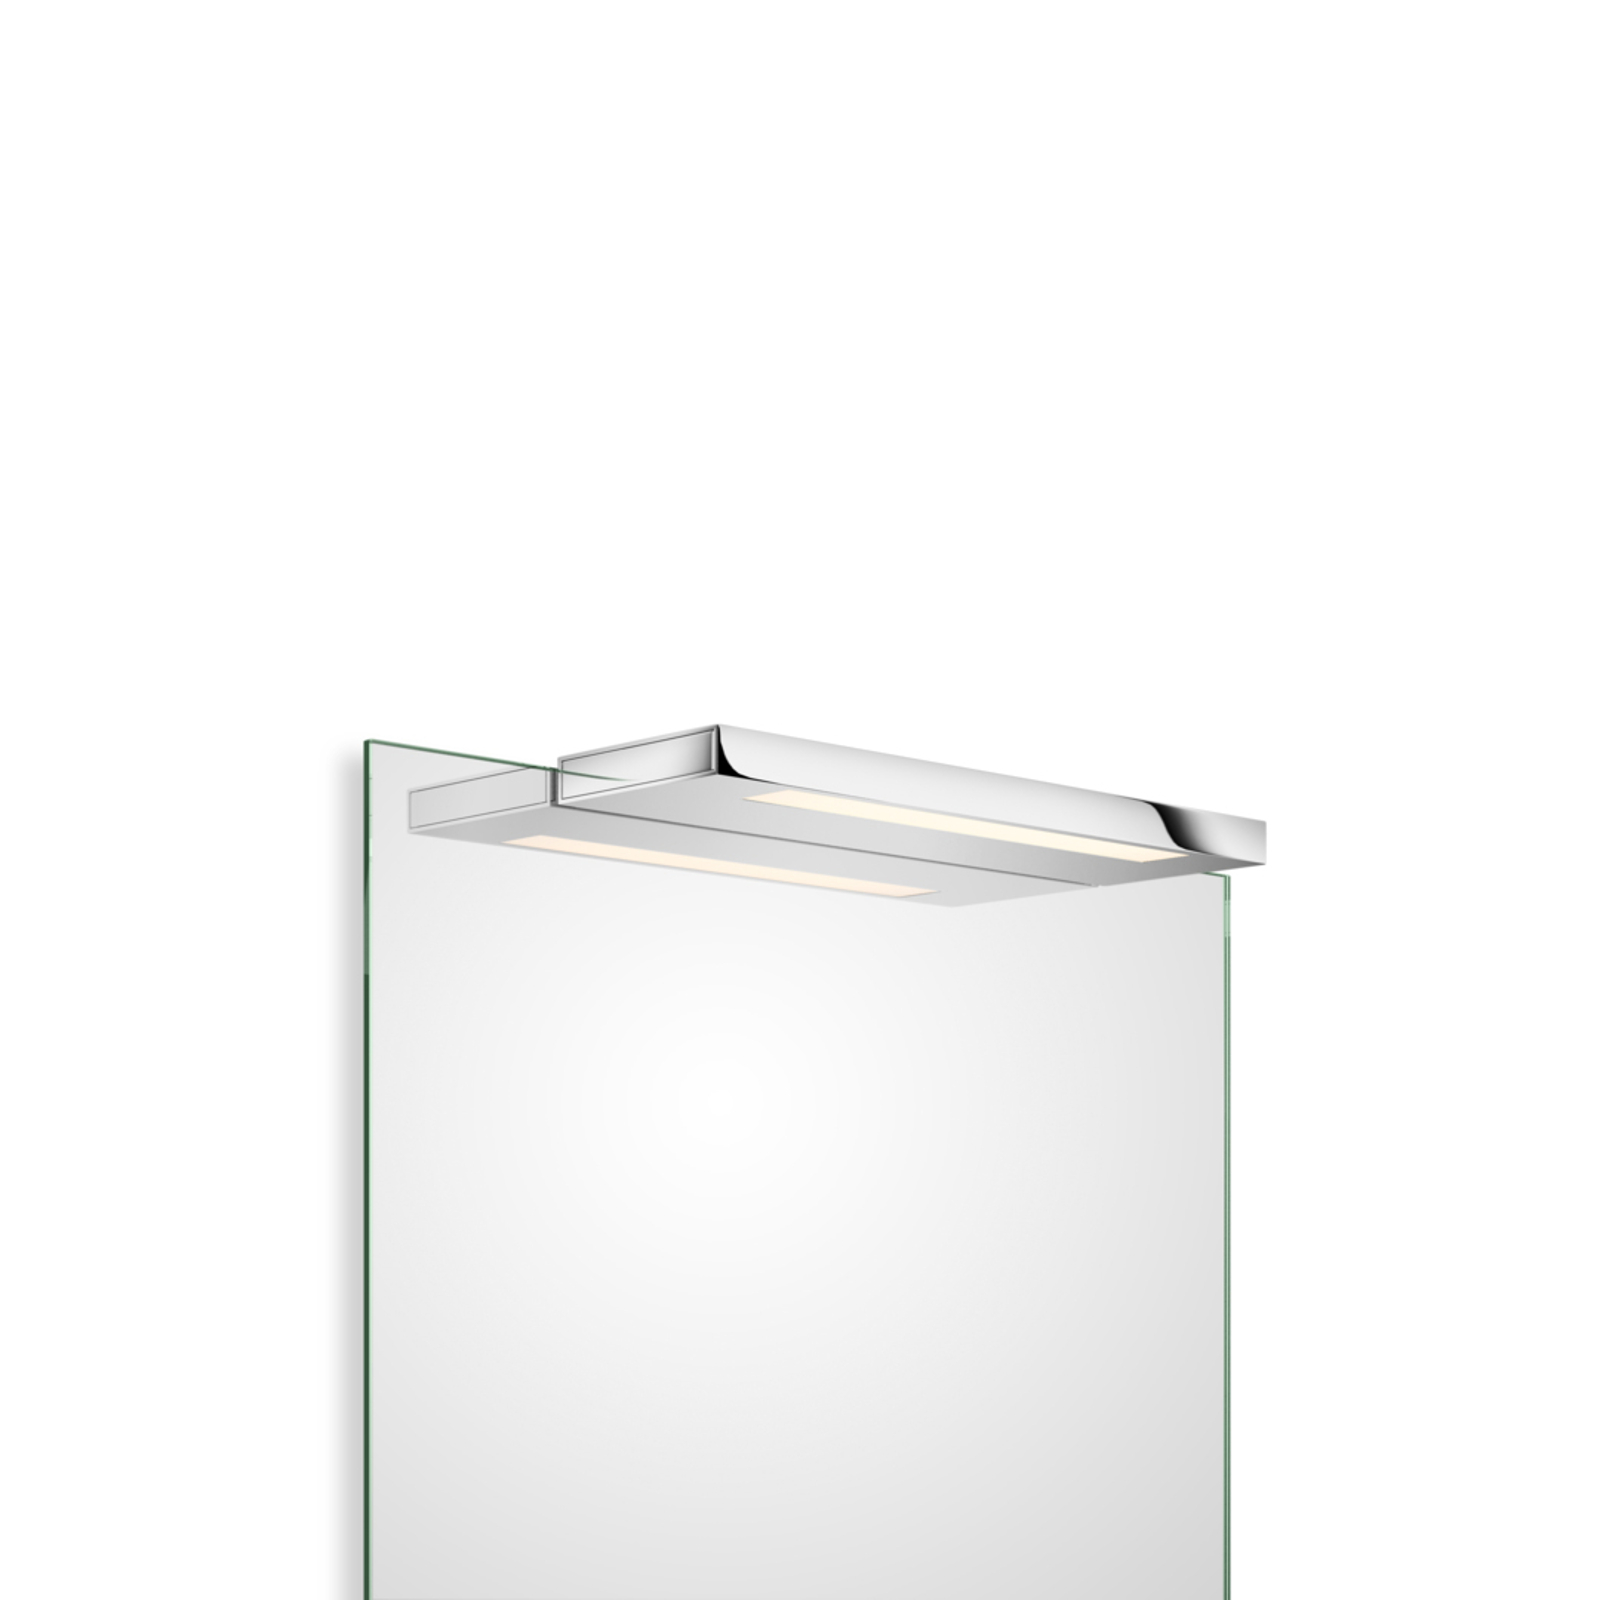 Decor Walther Slim LED spiegellamp chroom 34cm